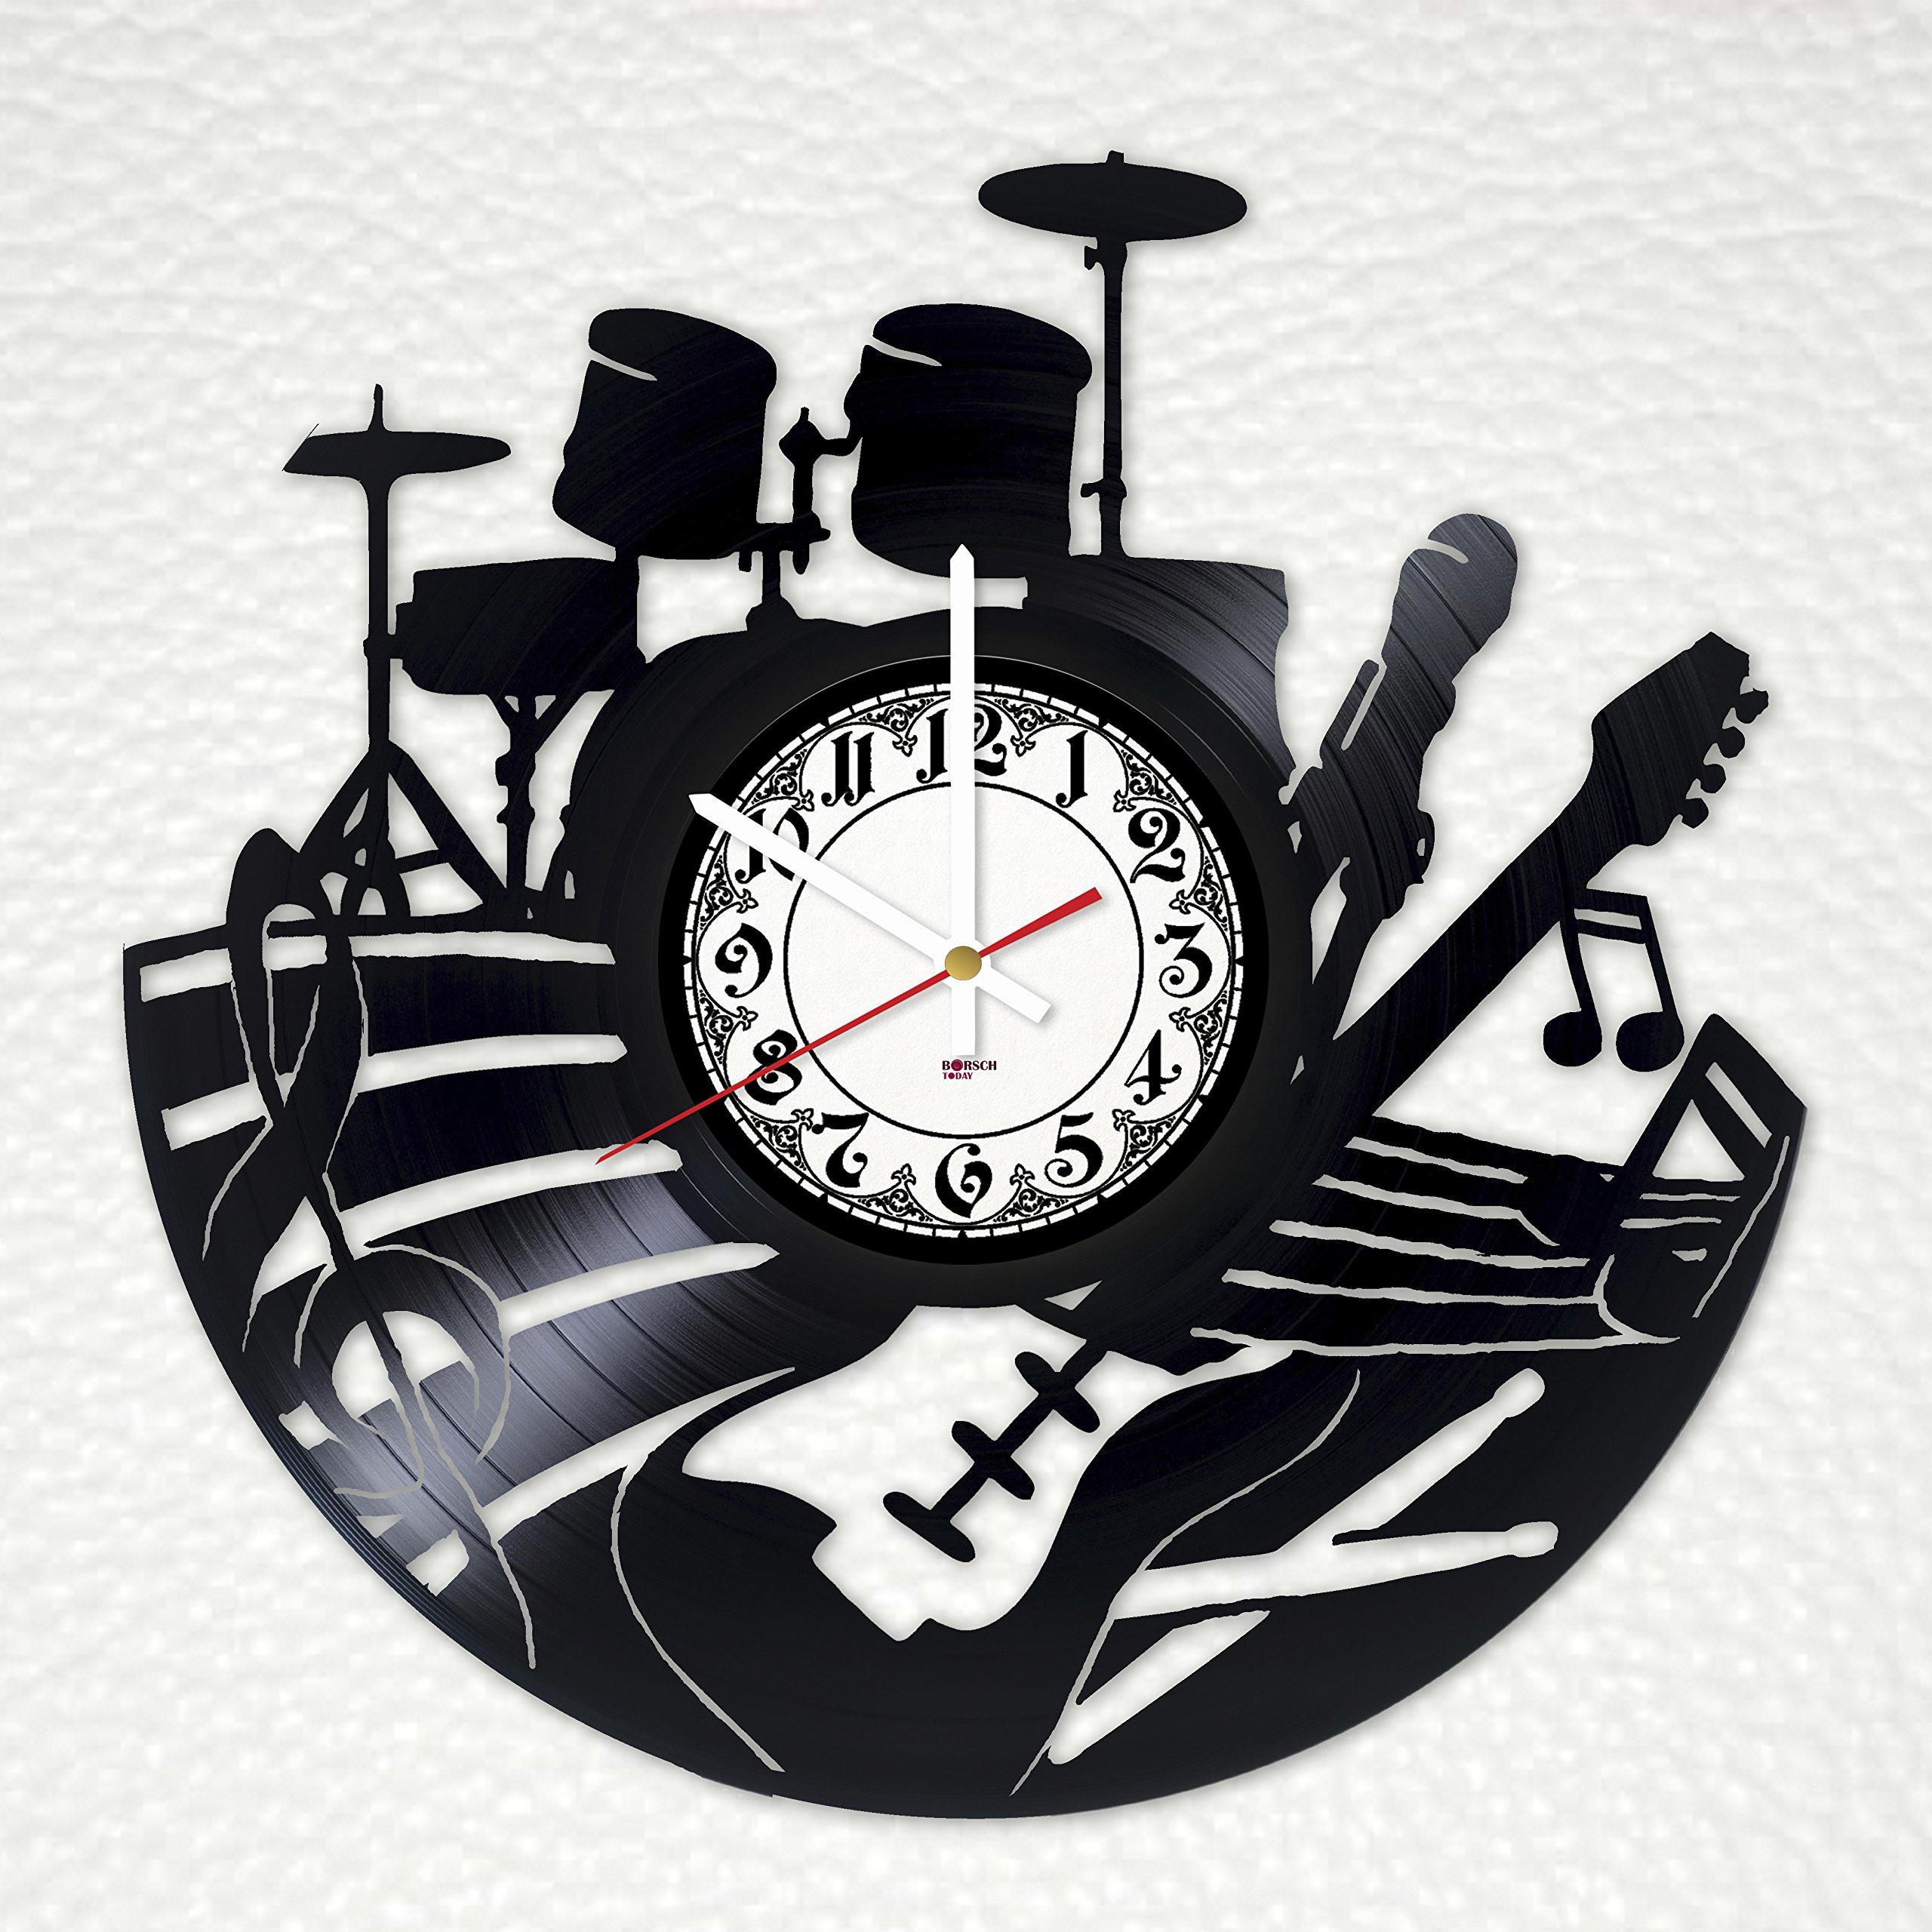 Music Decor Handmade Vinyl Record Wall Clock - Get unique home room wall decor - Gift ideas friends, parents – Dance Unique Modern Art Design